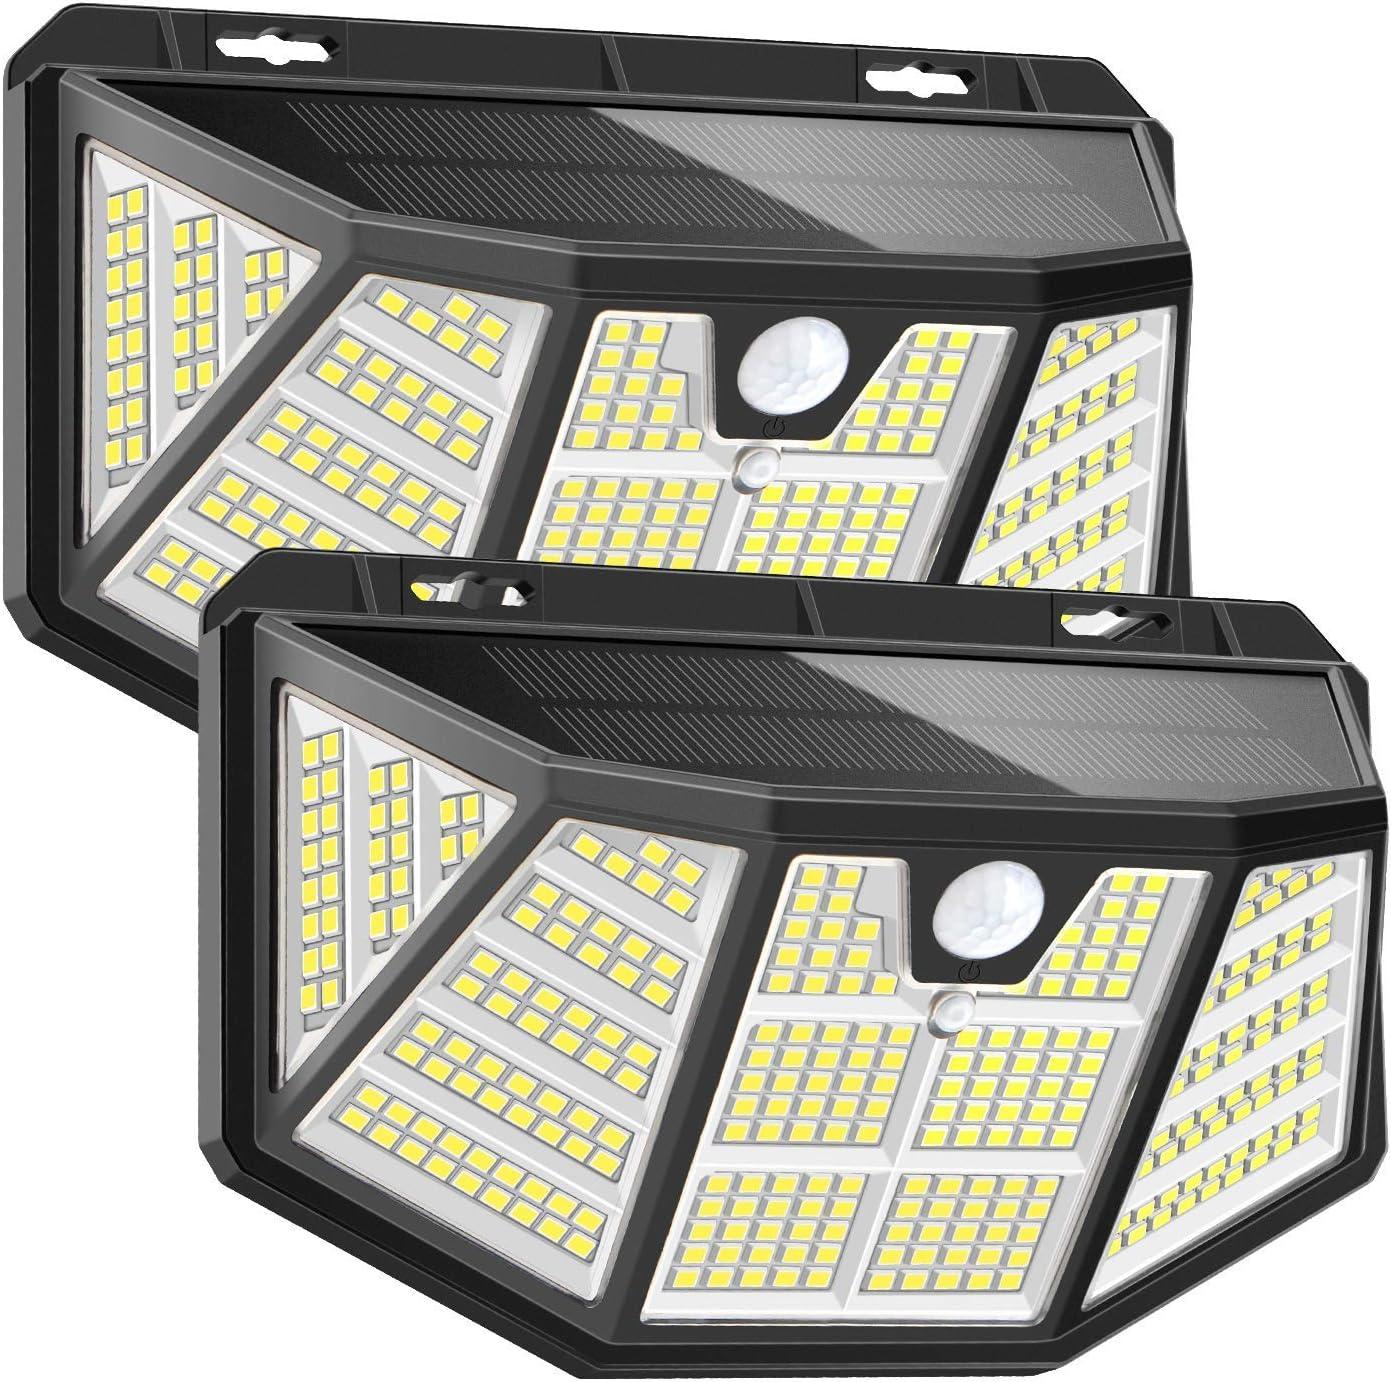 Pathinglek 2 Packs 310 LED Outdoor Solar Lights $19.99 Coupon